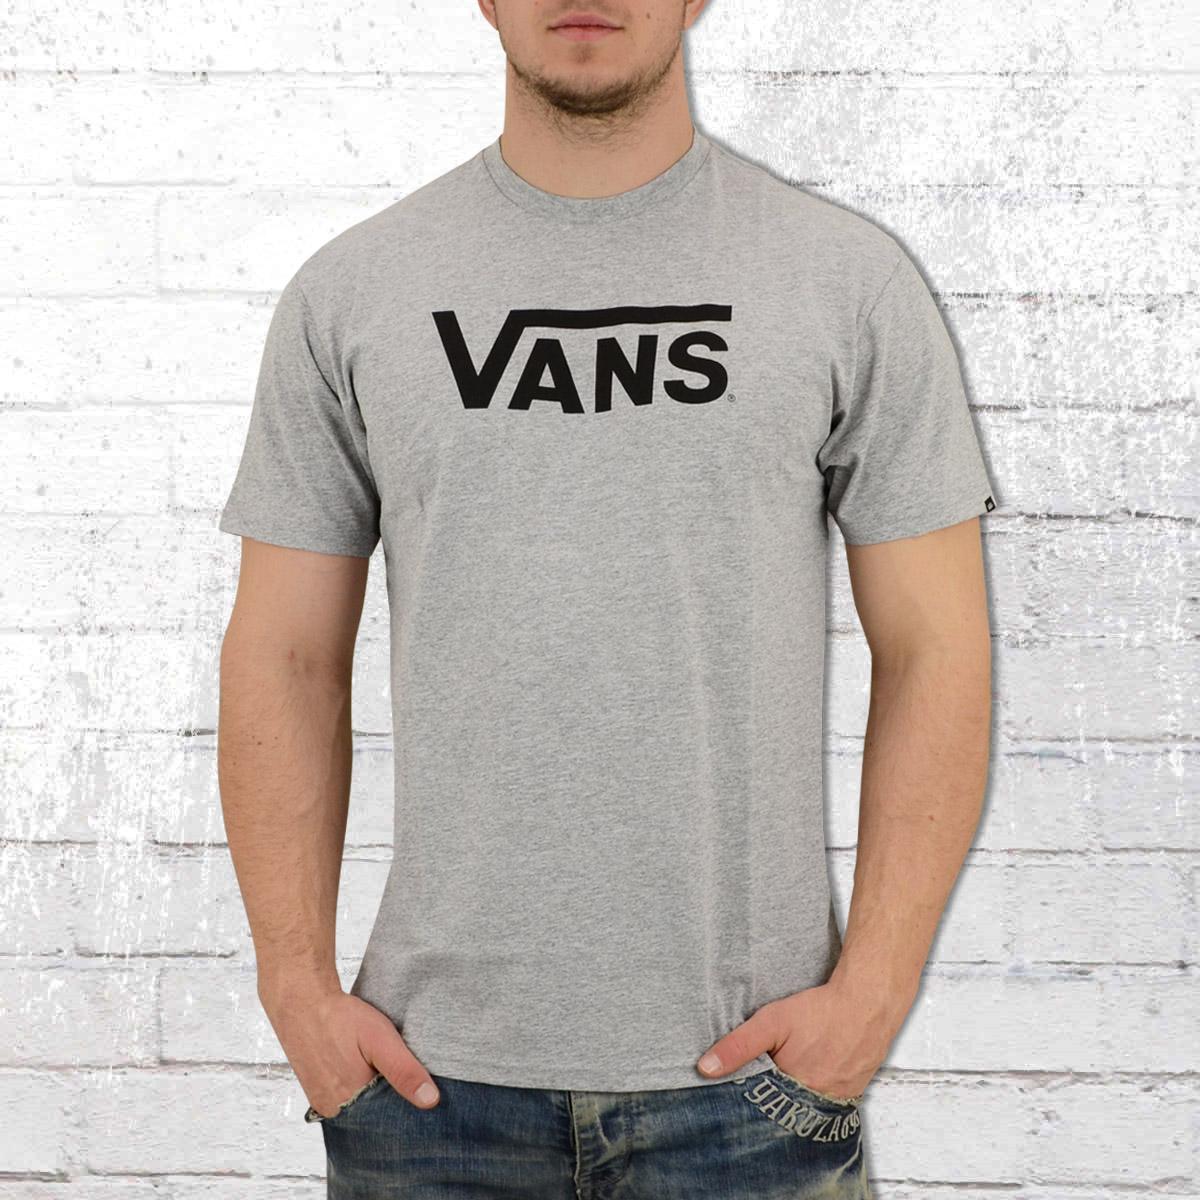 41c023cbc Order now | VANS Mens Classic Tee Shirt athletic grey heather black